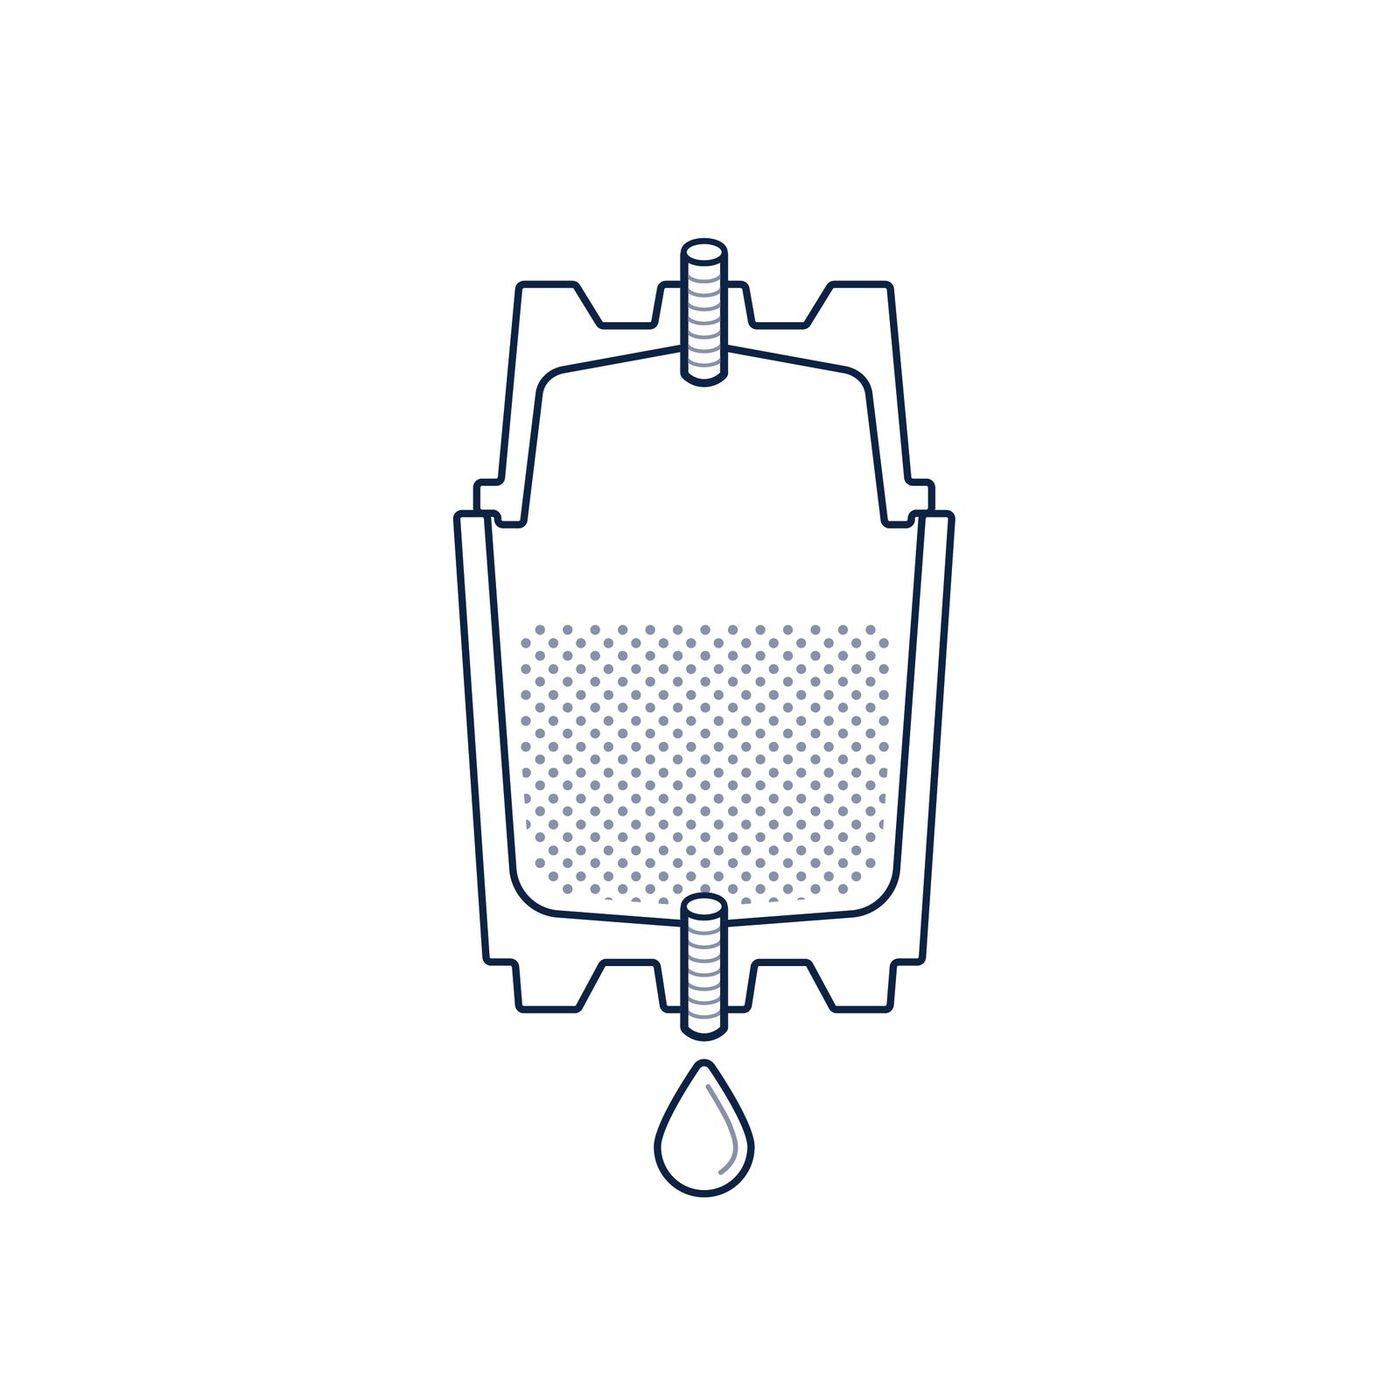 Soudage aluminothermique